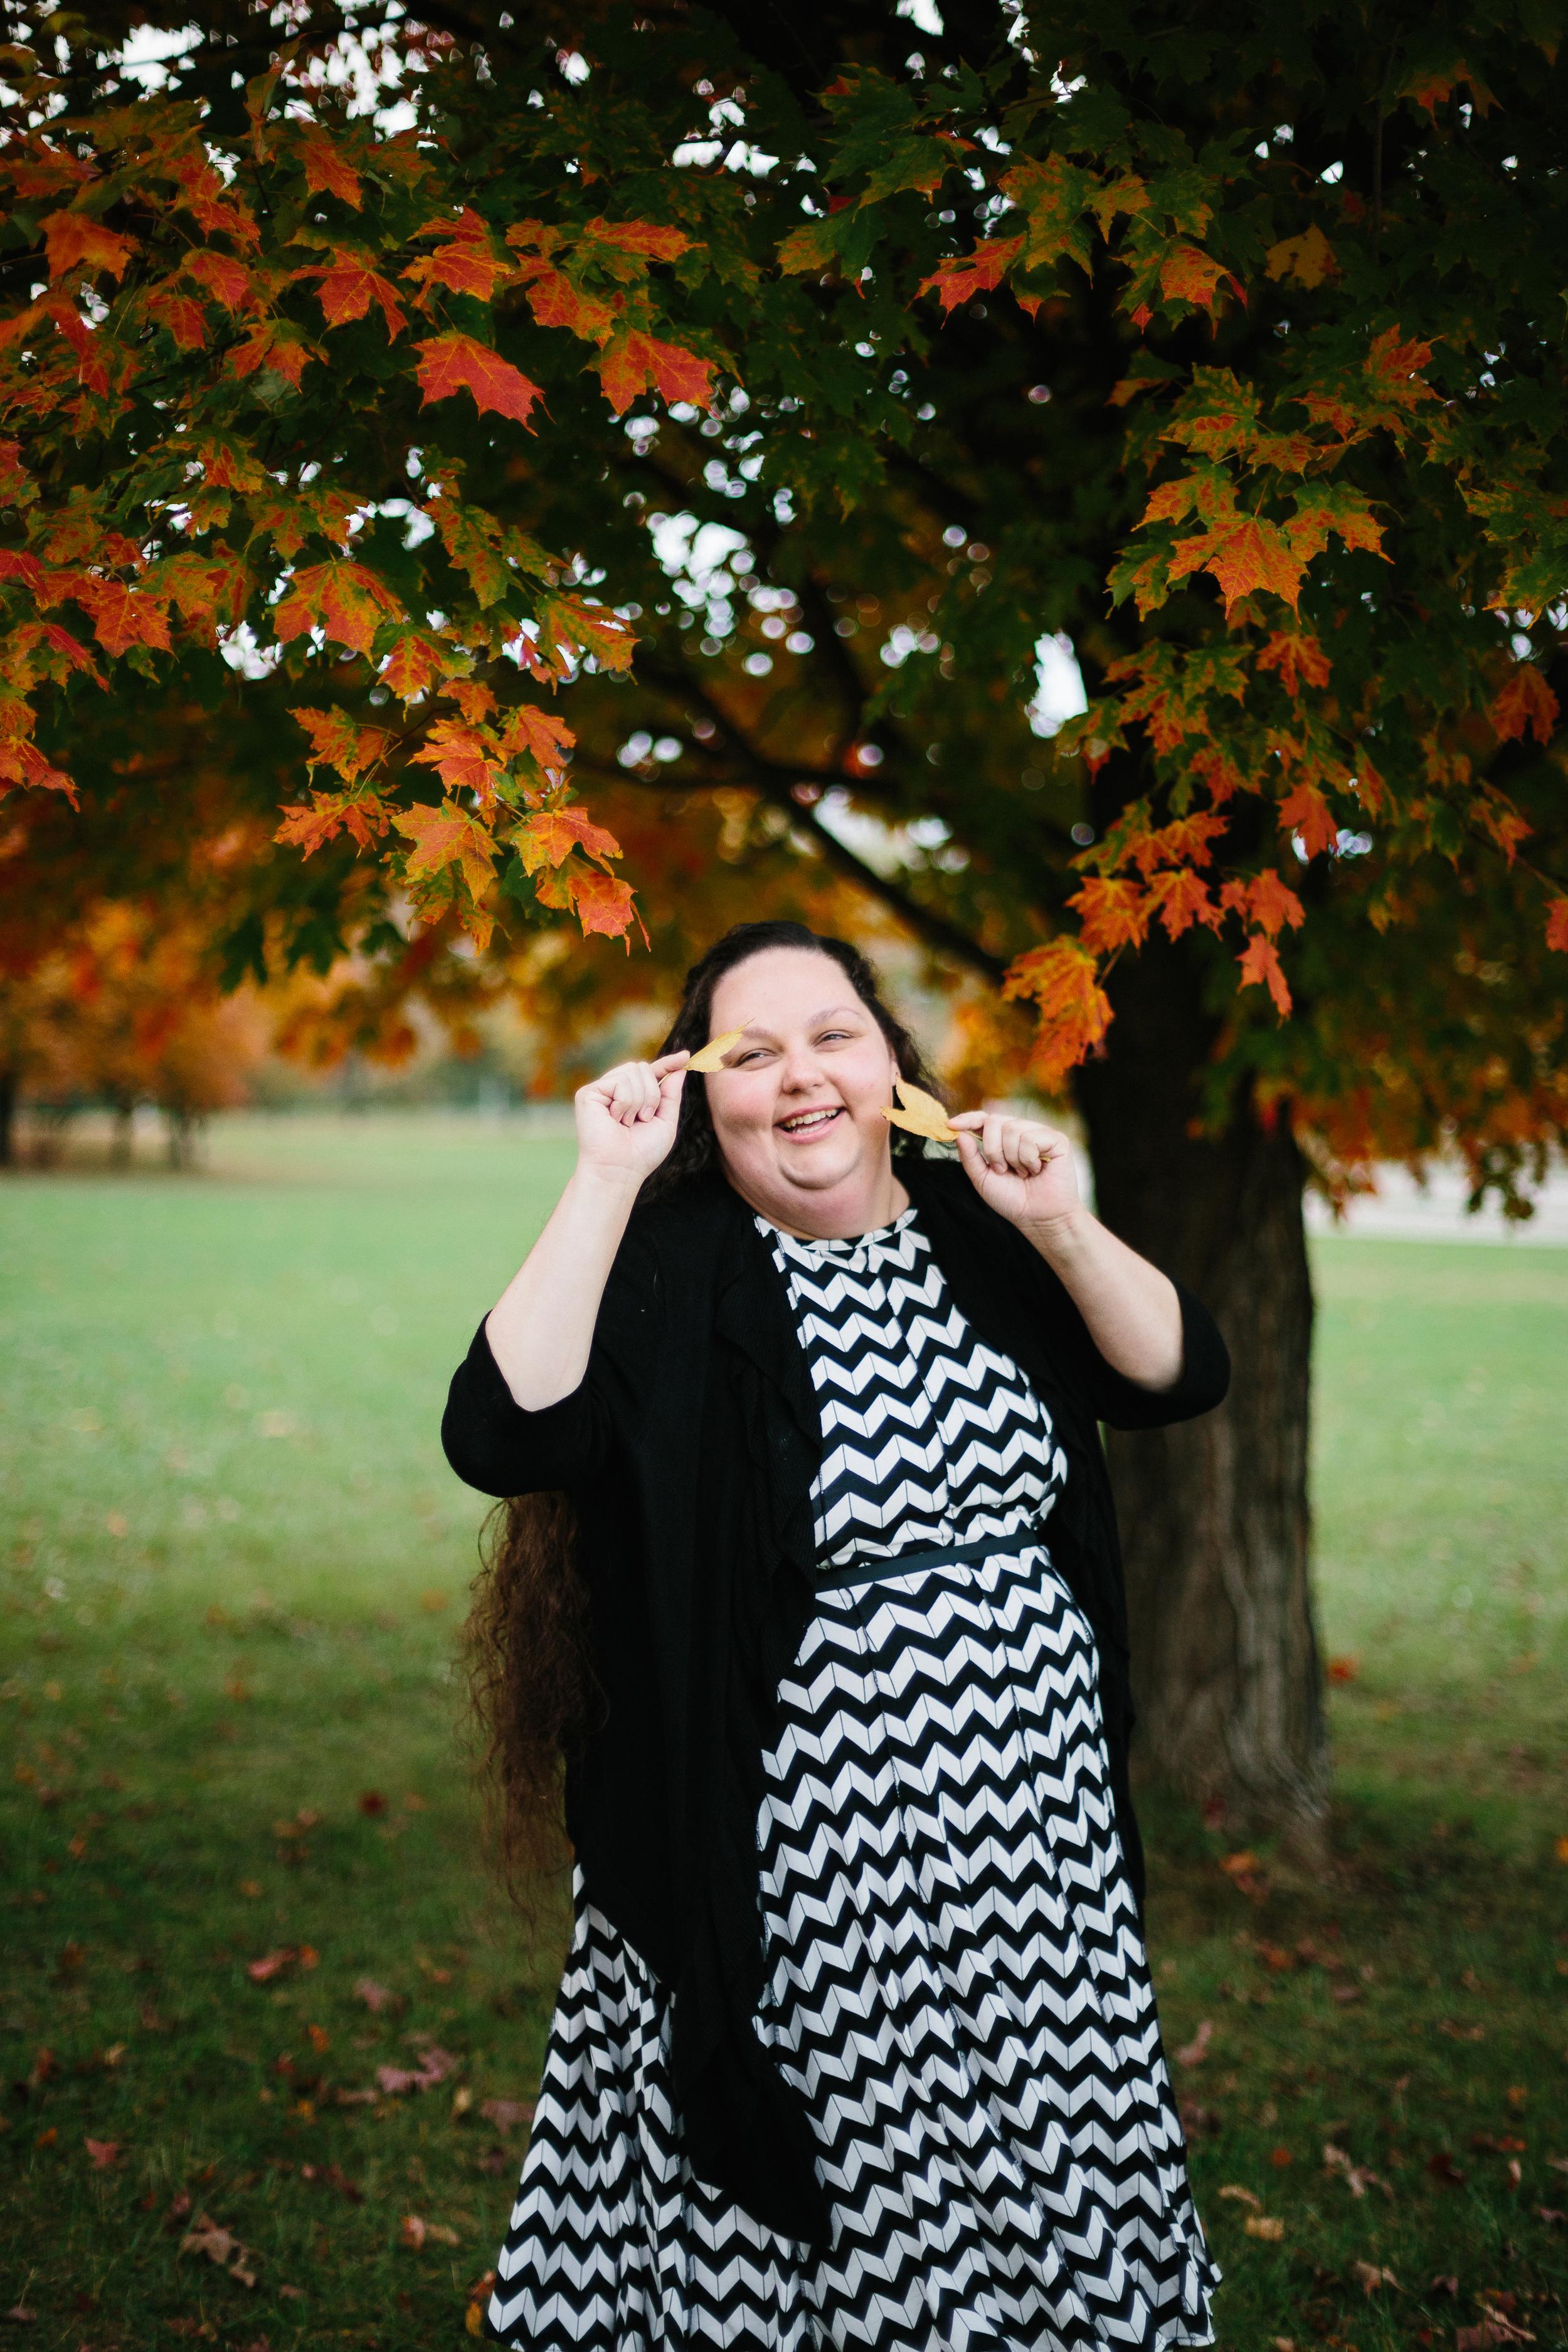 Carrillon Dayton Ohio - Cara Portraits - Corrie Mick Photography-55.jpg